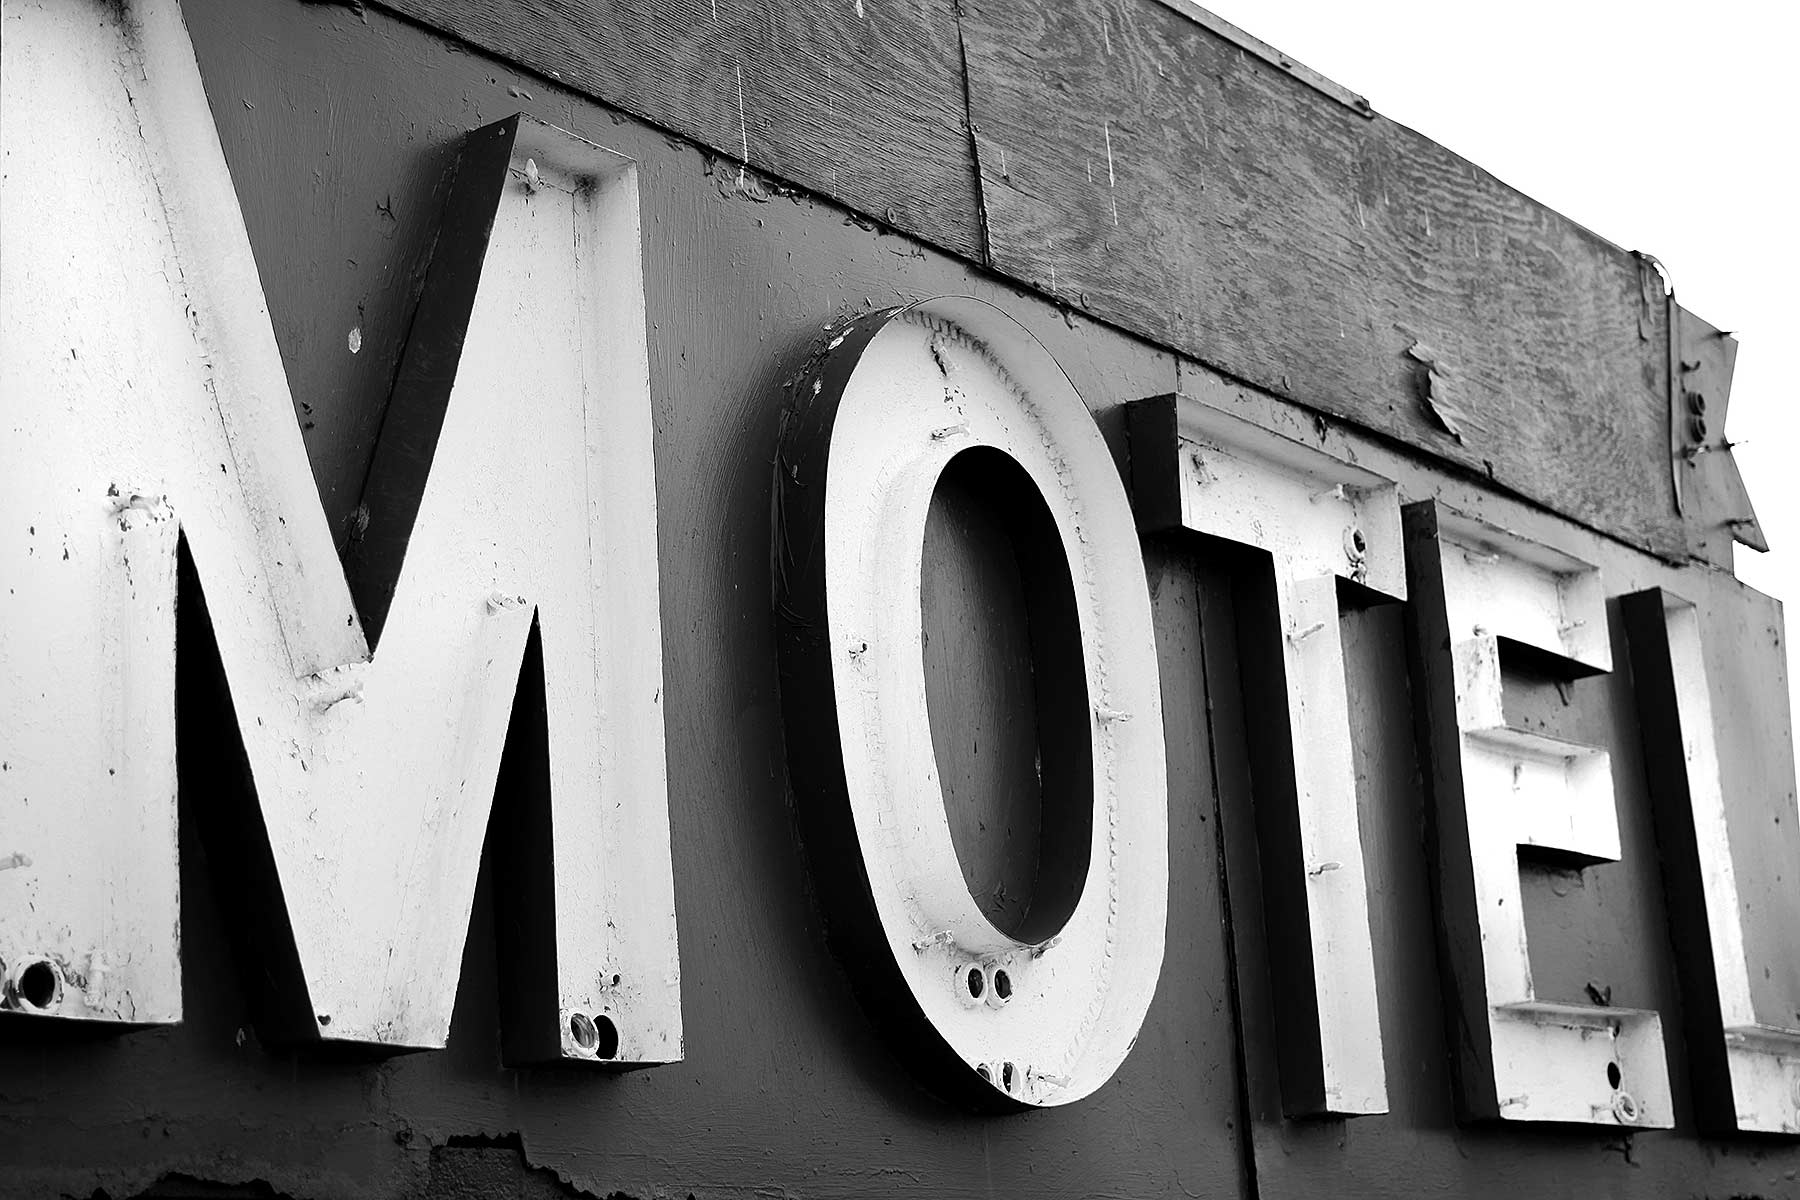 eastern shore motel sign